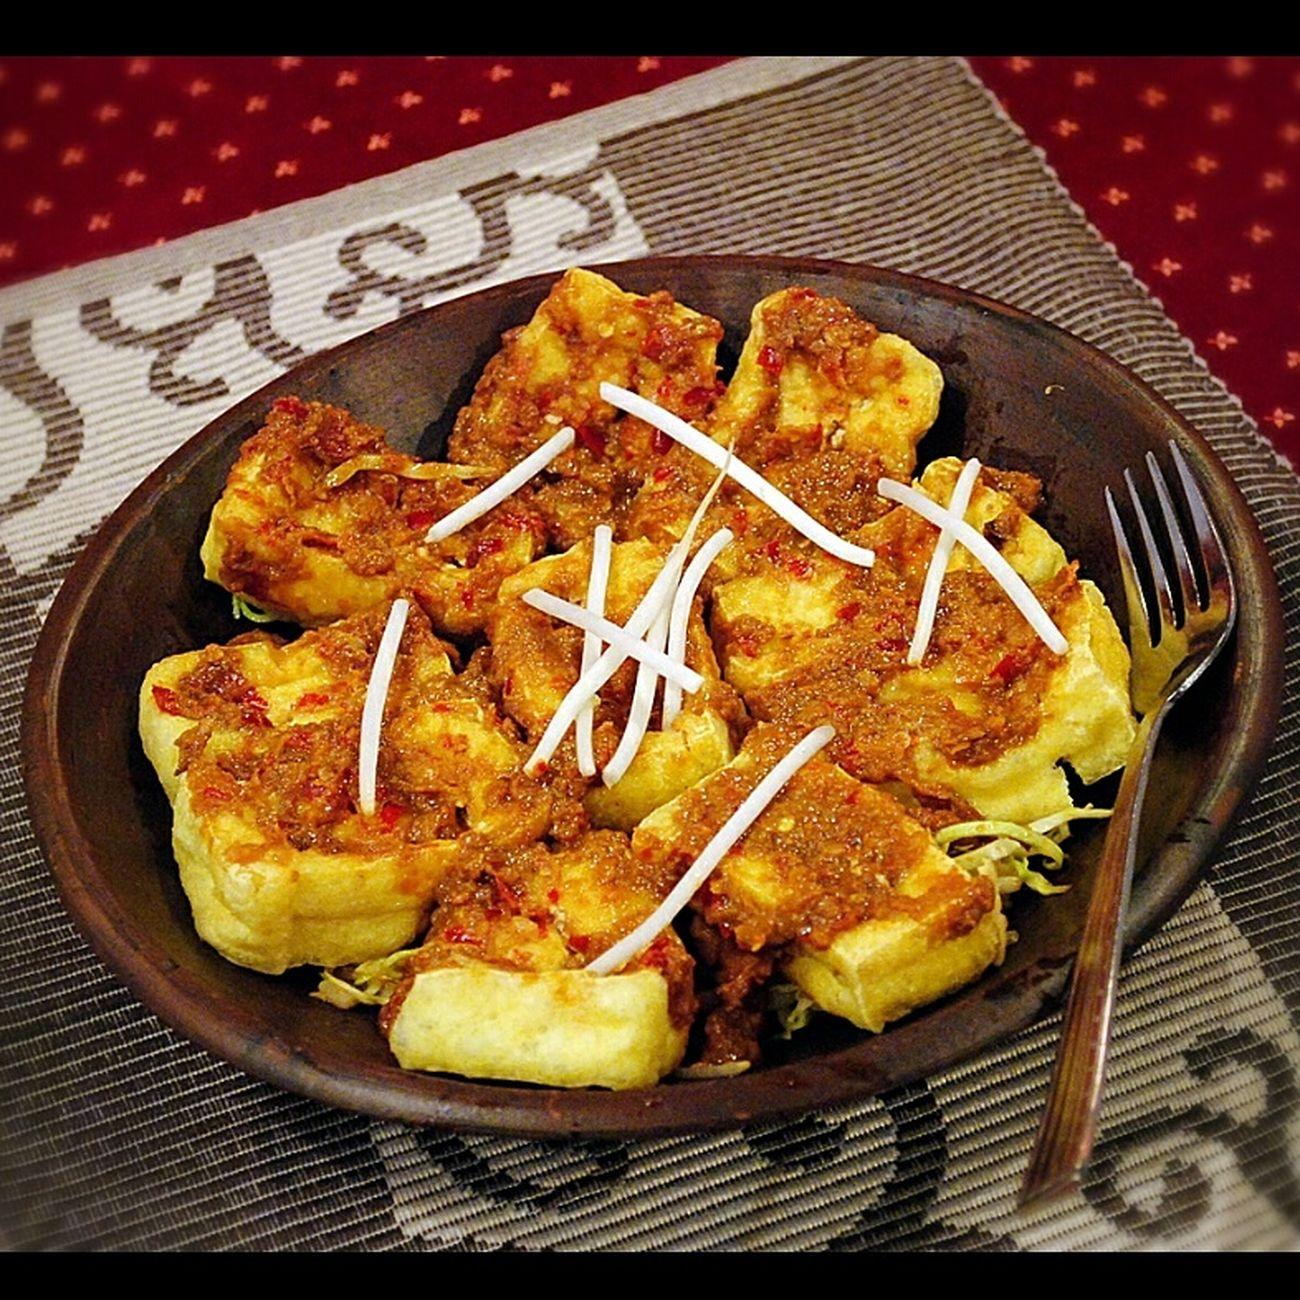 Spicy Food Dinner Tuenmun HongKong